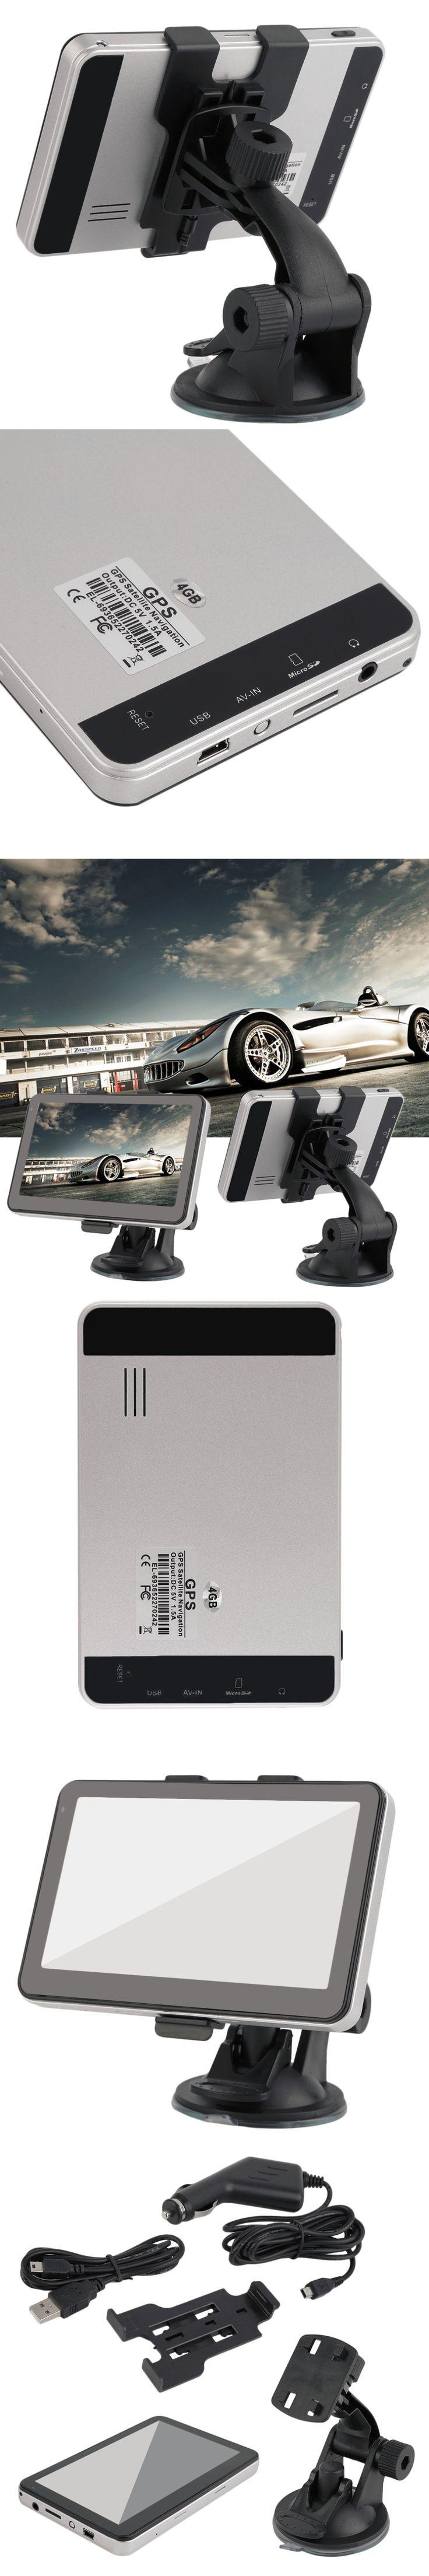 "5"" Inch Truck Lorry GPS Navigation 128MB 8GB SAT NAV Maps Free Update SpeedCam Navigator 800MHZ WinCE 6.0 FM Hot Selling"